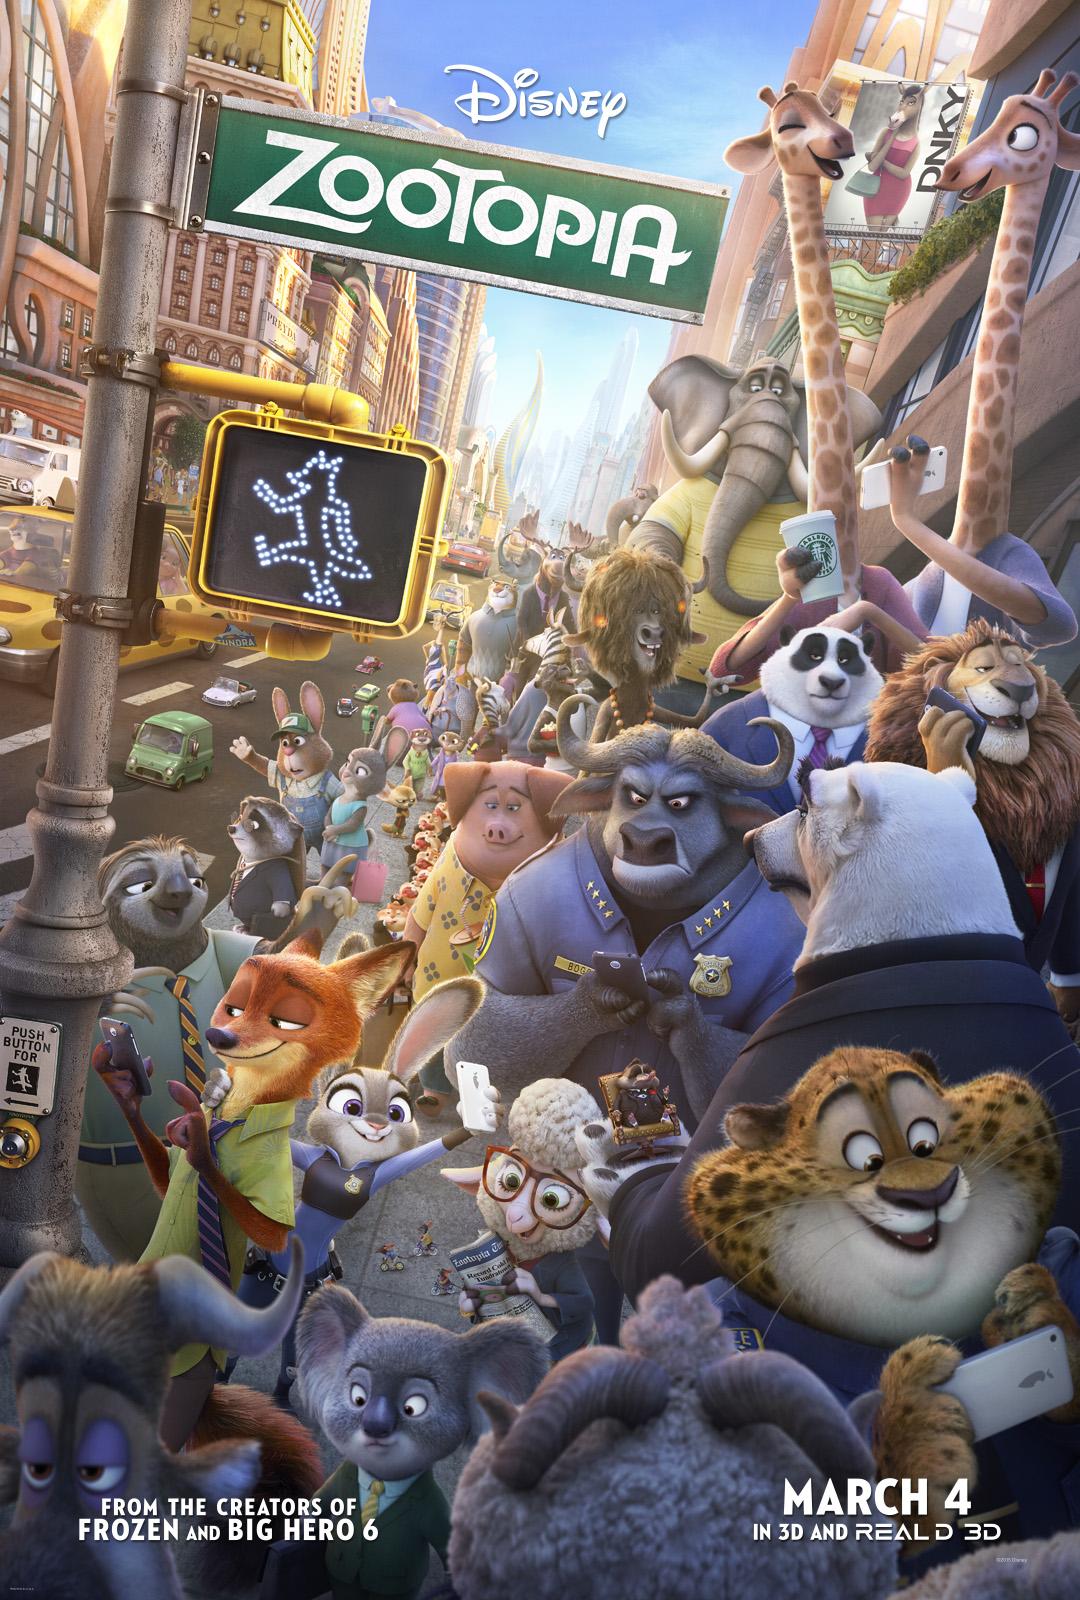 melhores filmes de comedia de 2016 – Zootopia